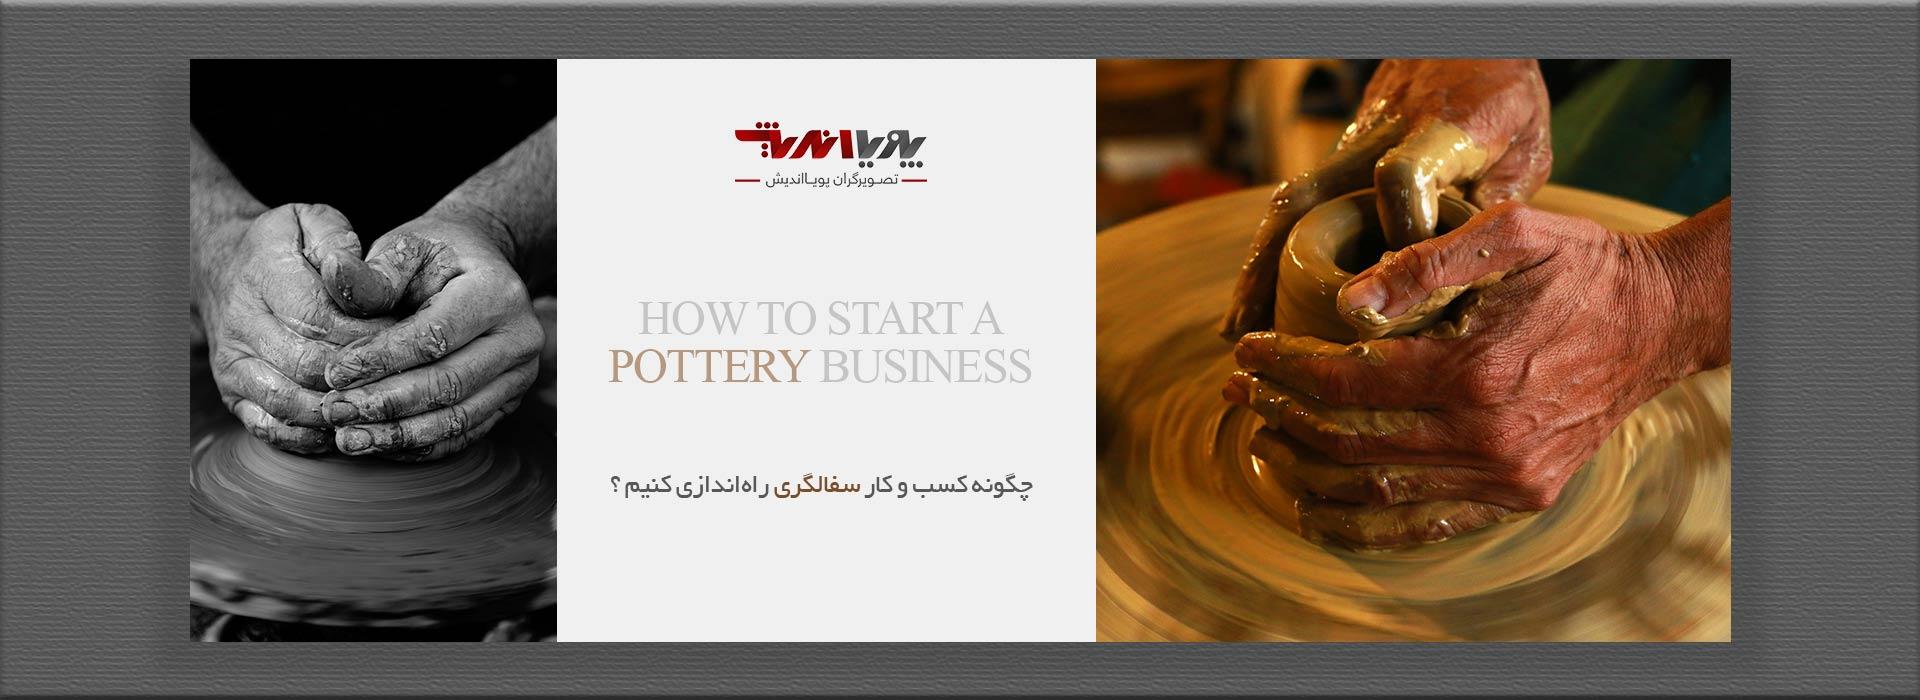 POTTERY BUSINESS - چگونه کسب و کار سفالگری راه اندازی کنیم ؟